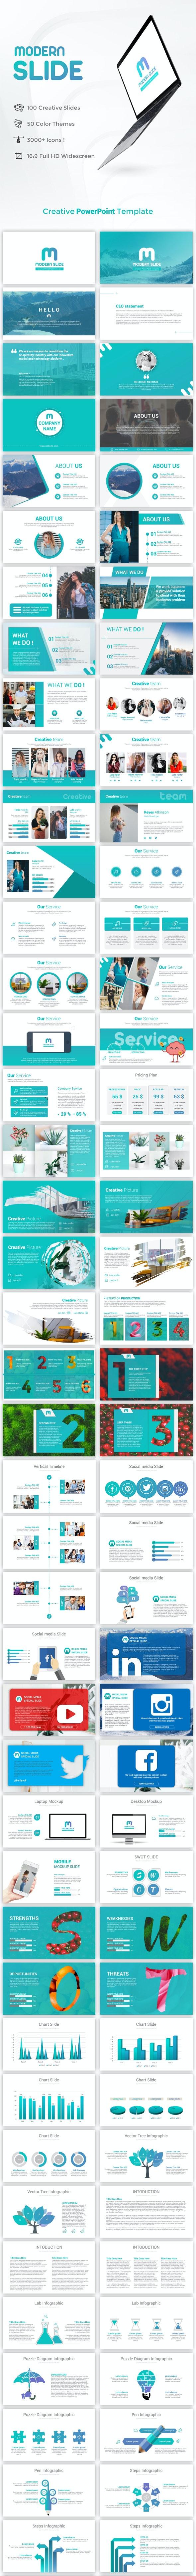 Modern Slide PowerPoint Presentation Template - PowerPoint Templates Presentation Templates